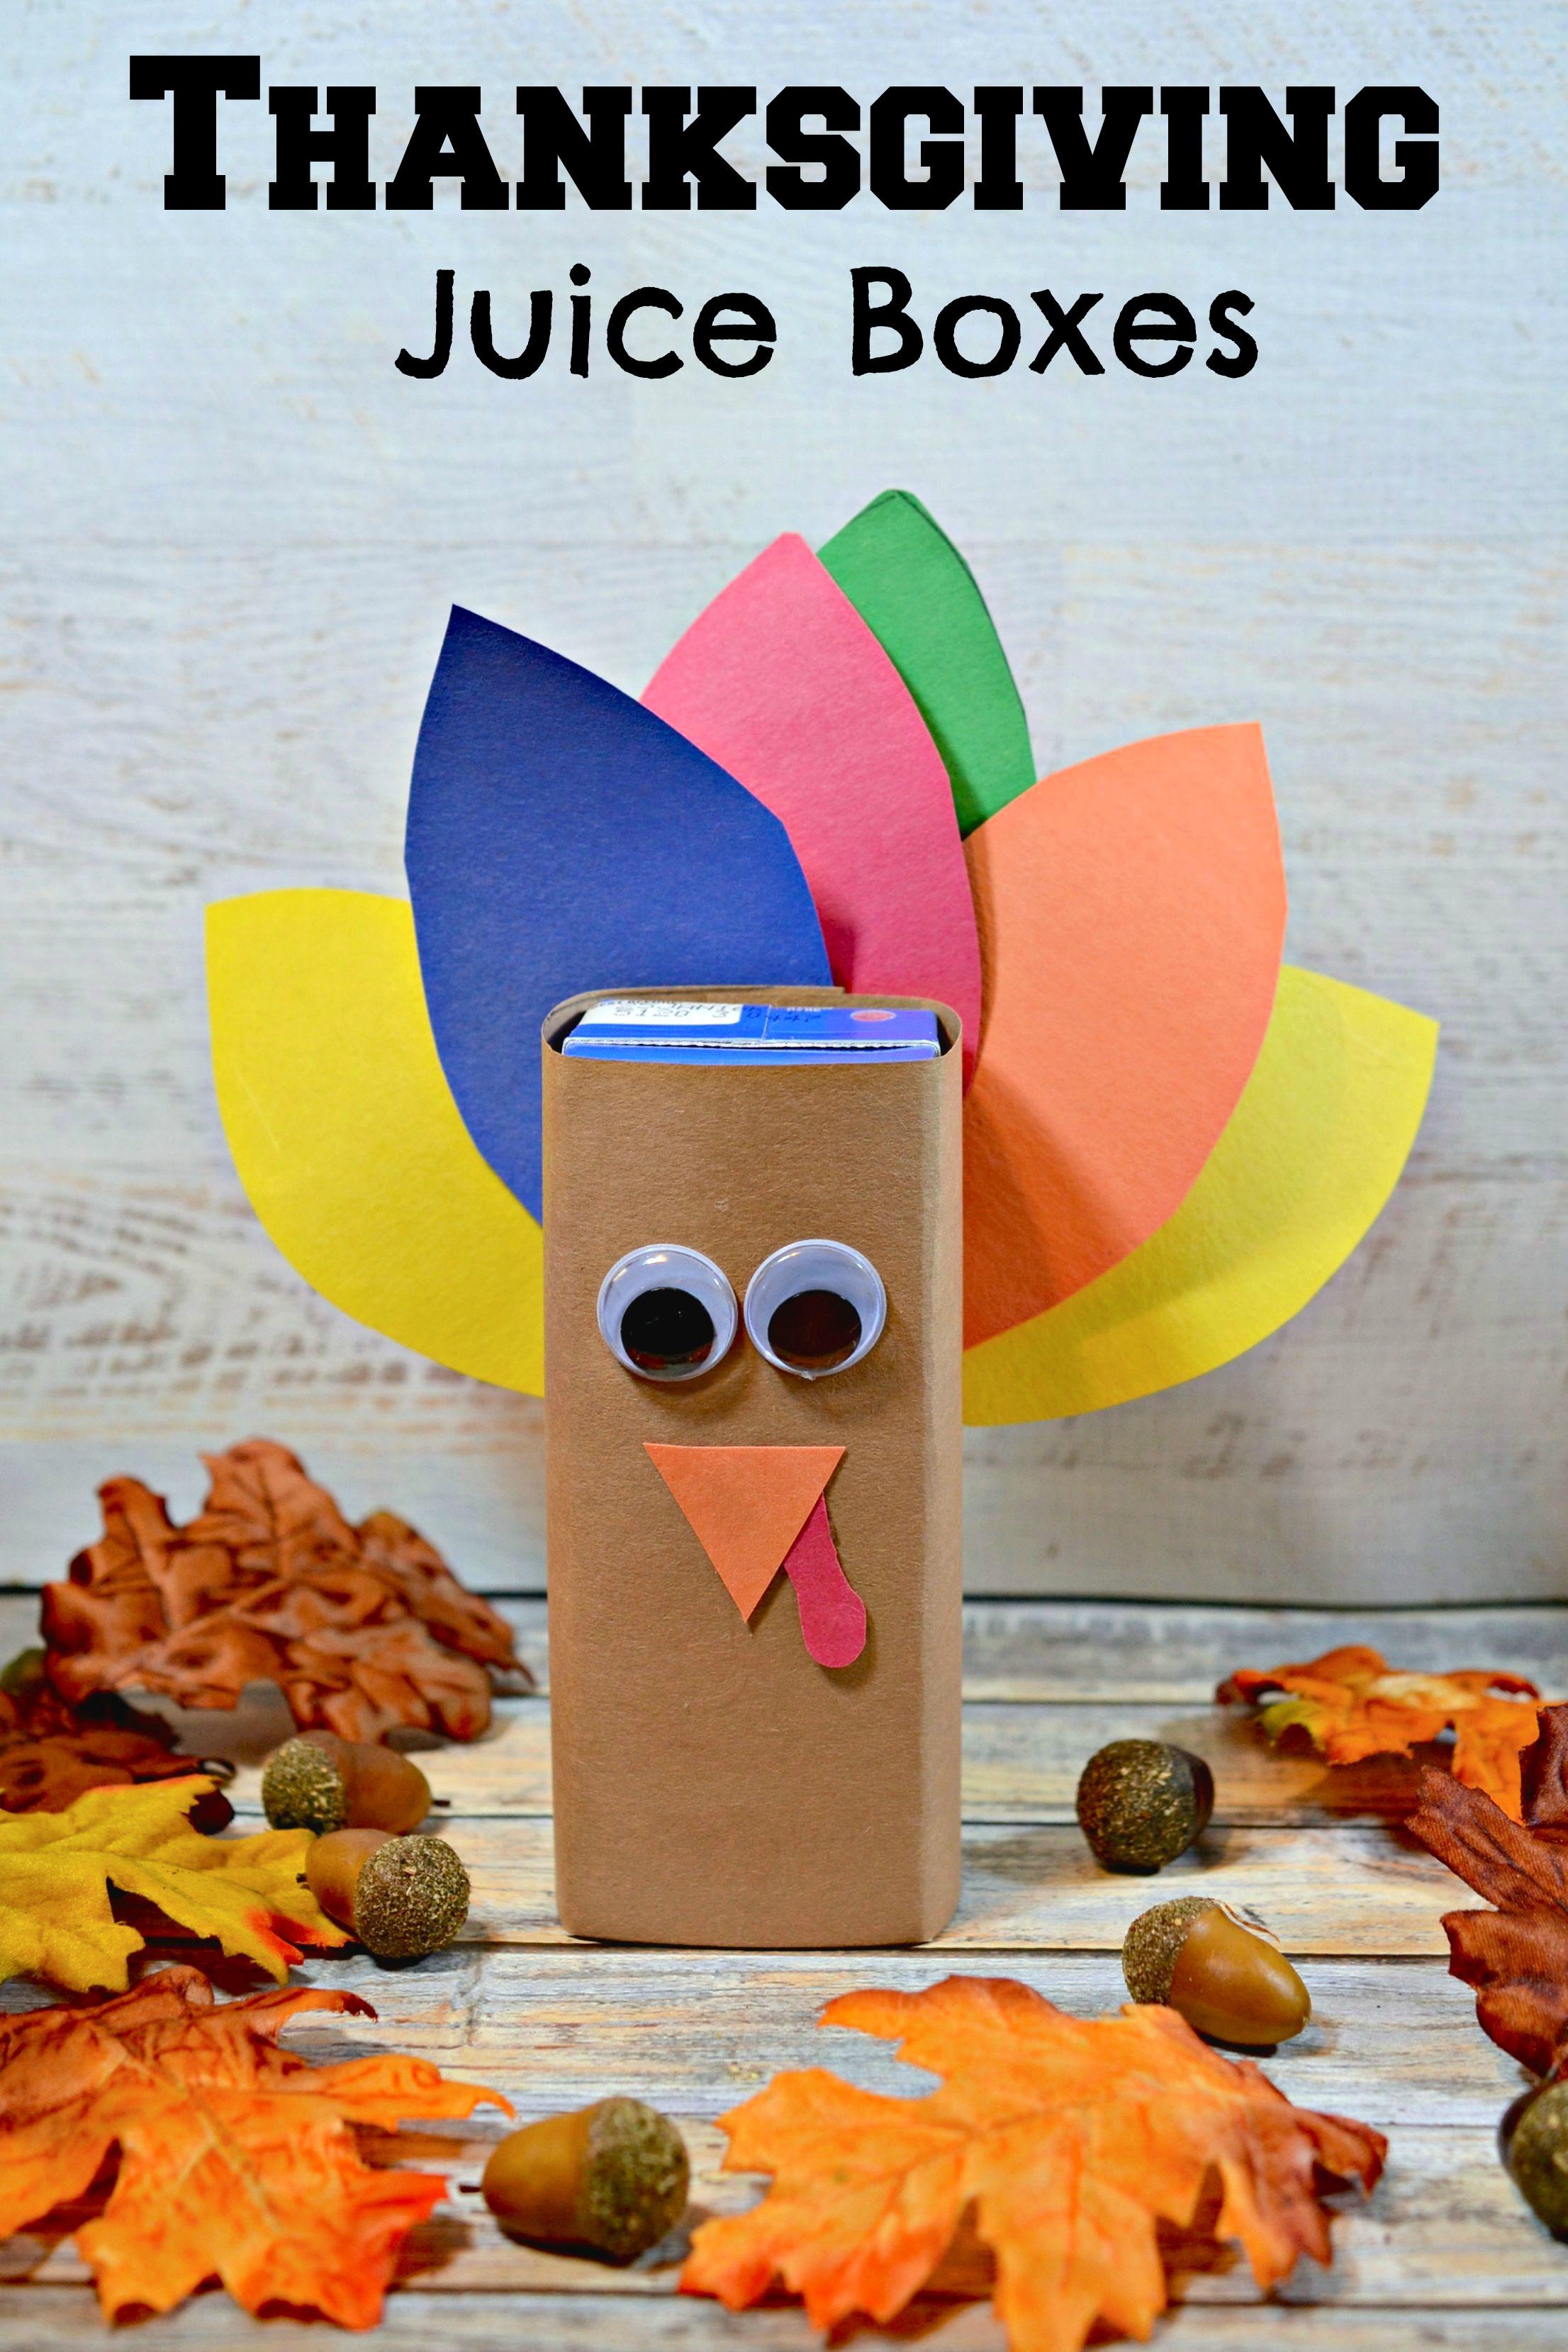 Thanksgiving Turkey Juice Box Idea For Kids